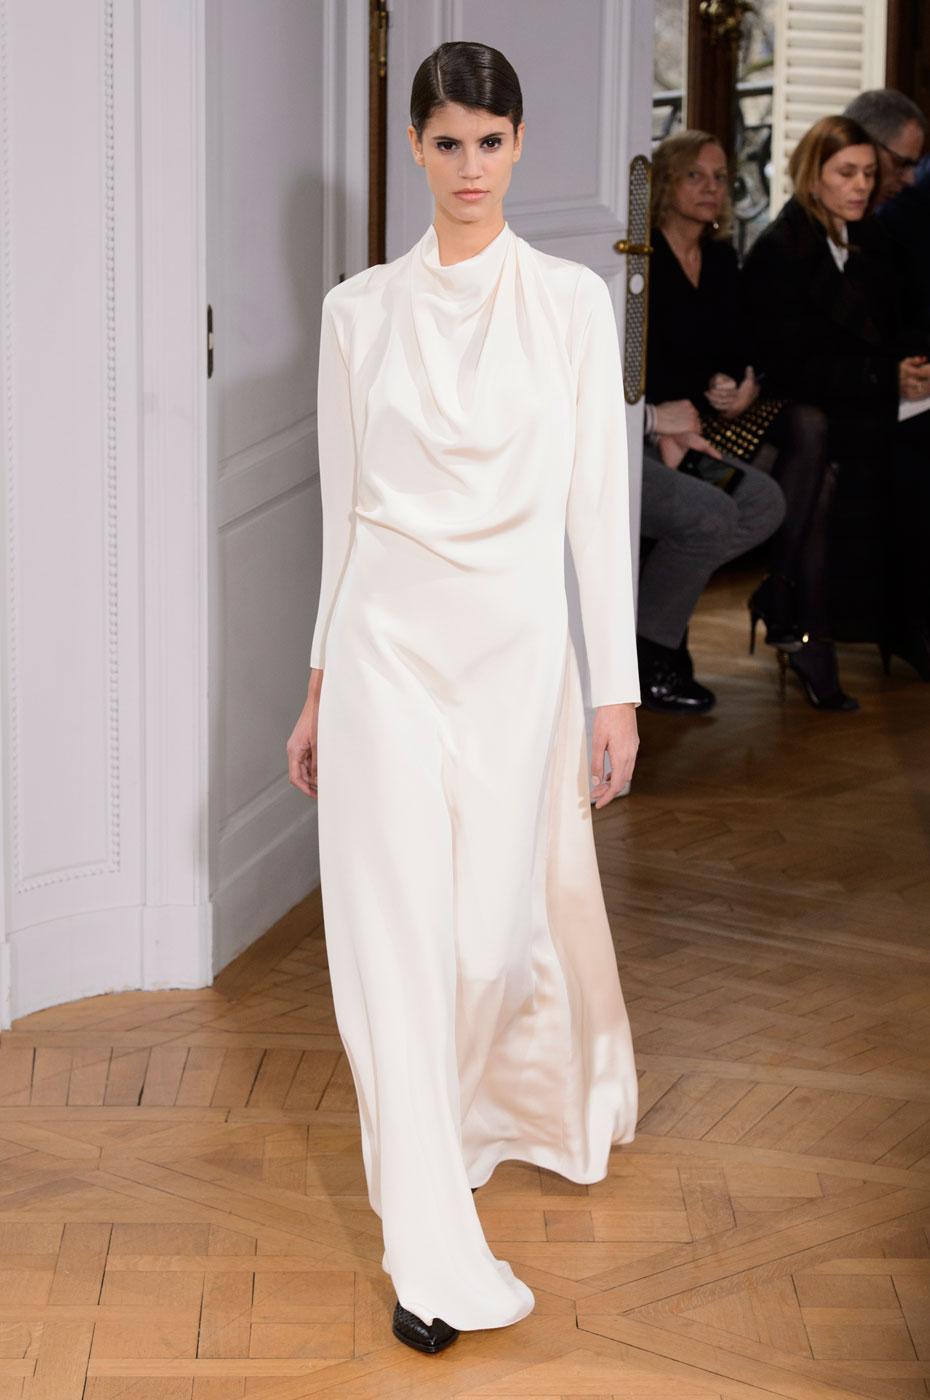 Bouchra-Jarrar-fashion-runway-show-haute-couture-paris-spring-summer-2015-the-impression-19